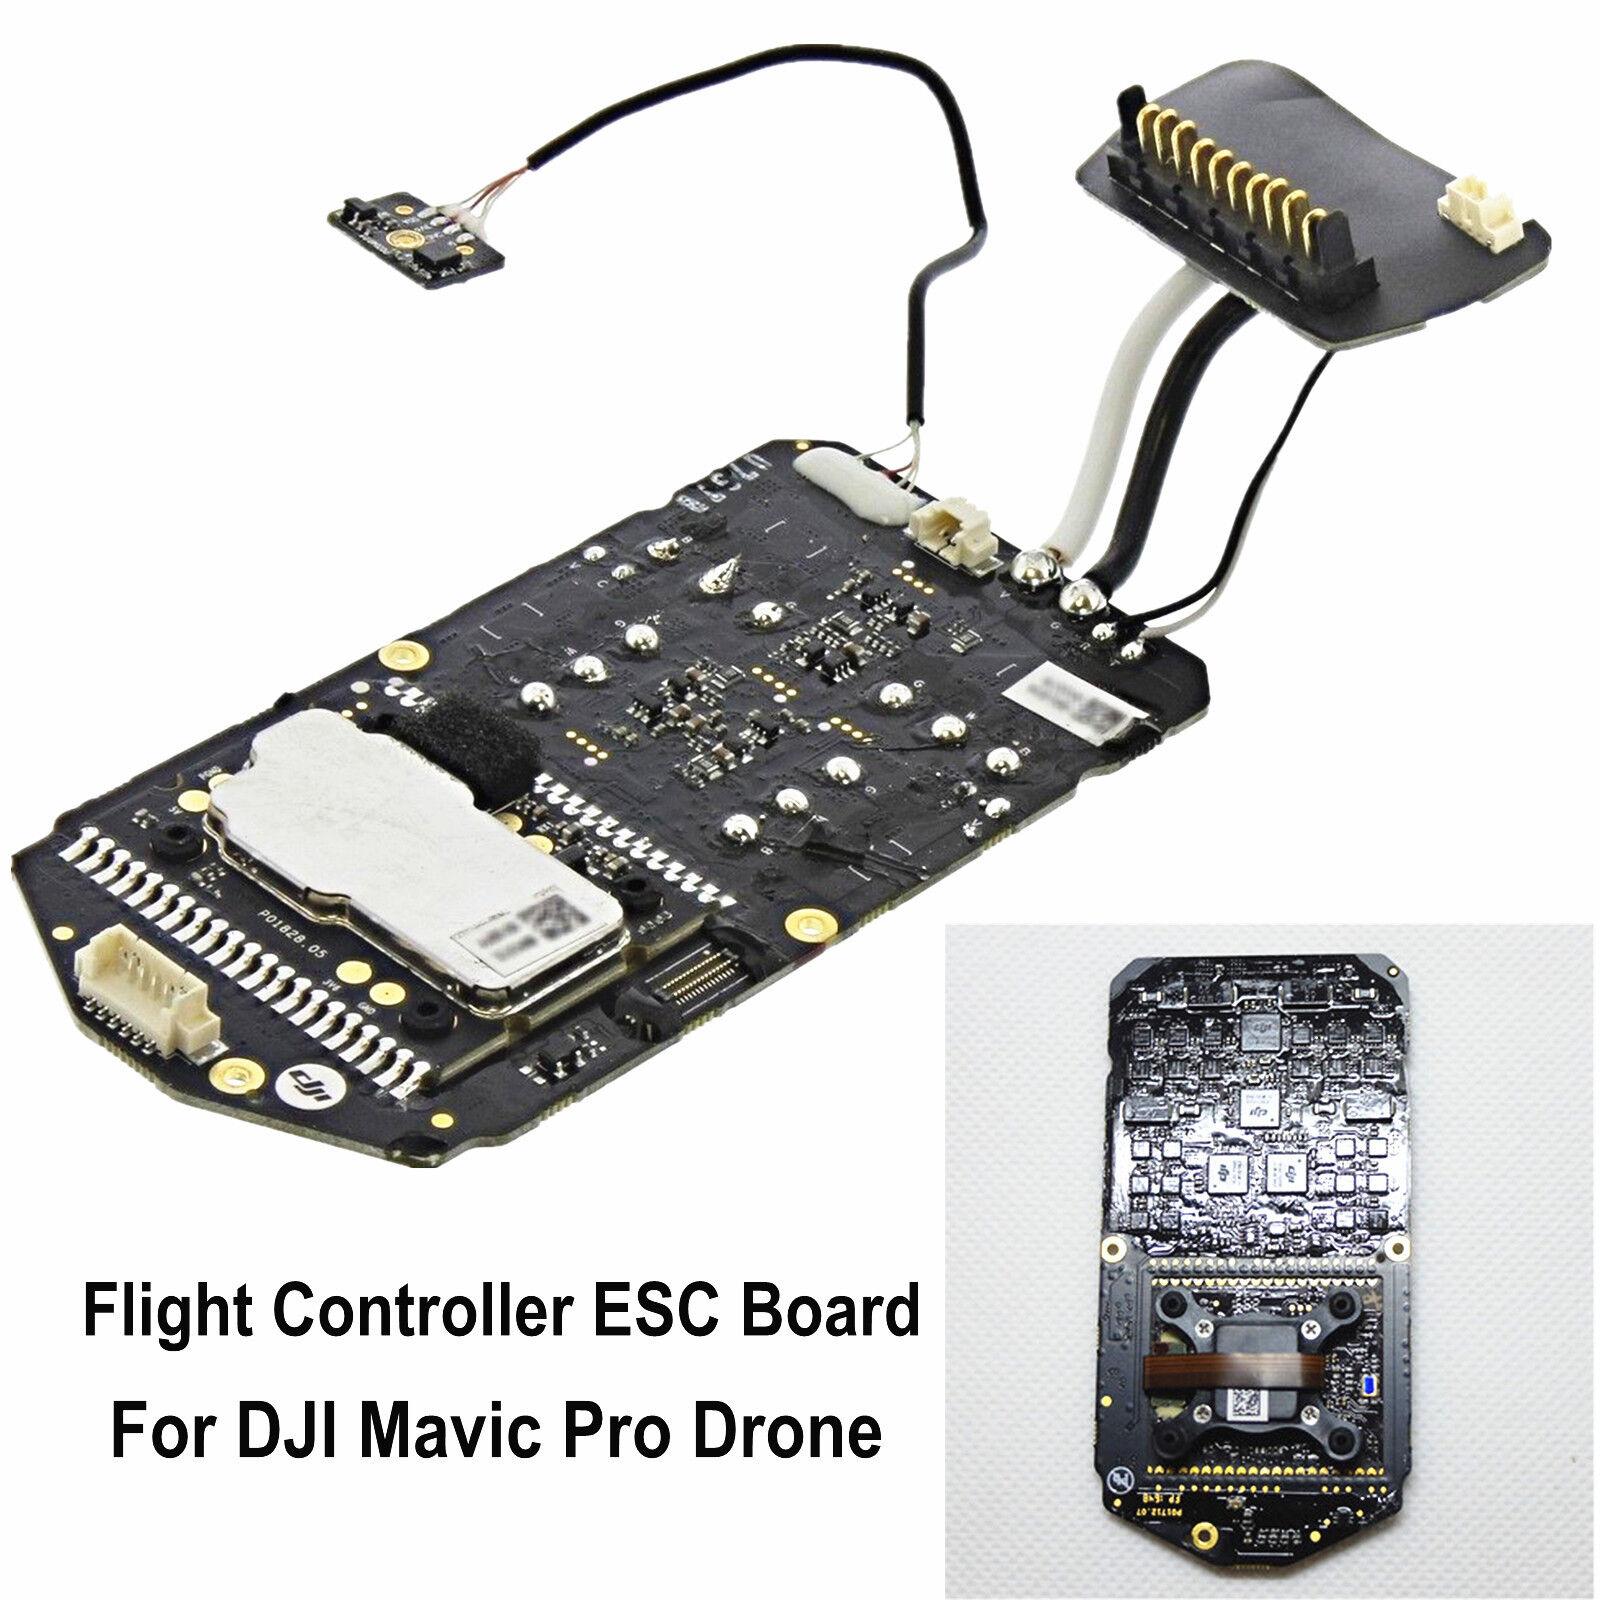 For DJI Mavic Pro Drone - NEW Flight Controller ESC, Power Board & Compass